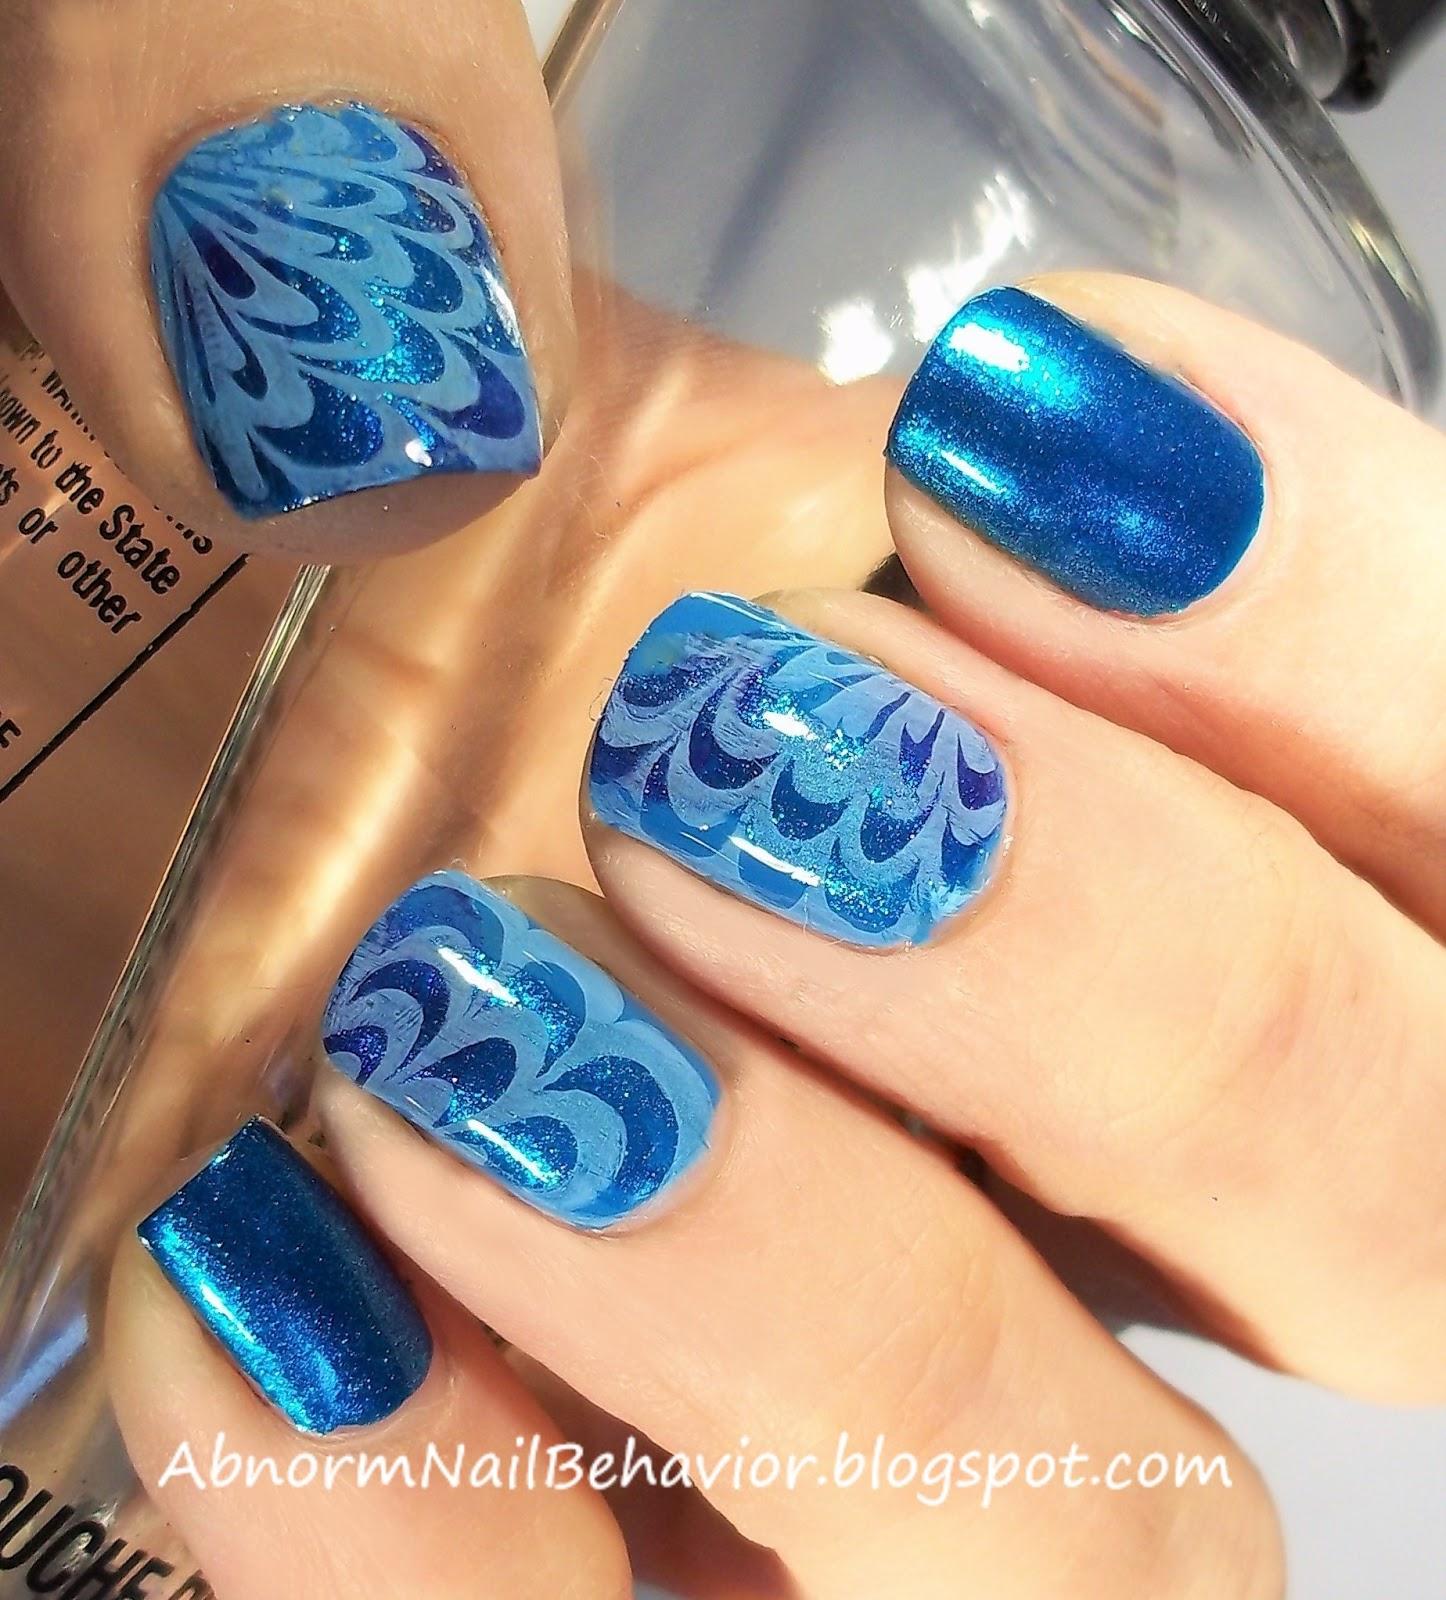 Abnorm Nail Behavior | Nail Art : Metallic Blue Marble Nails